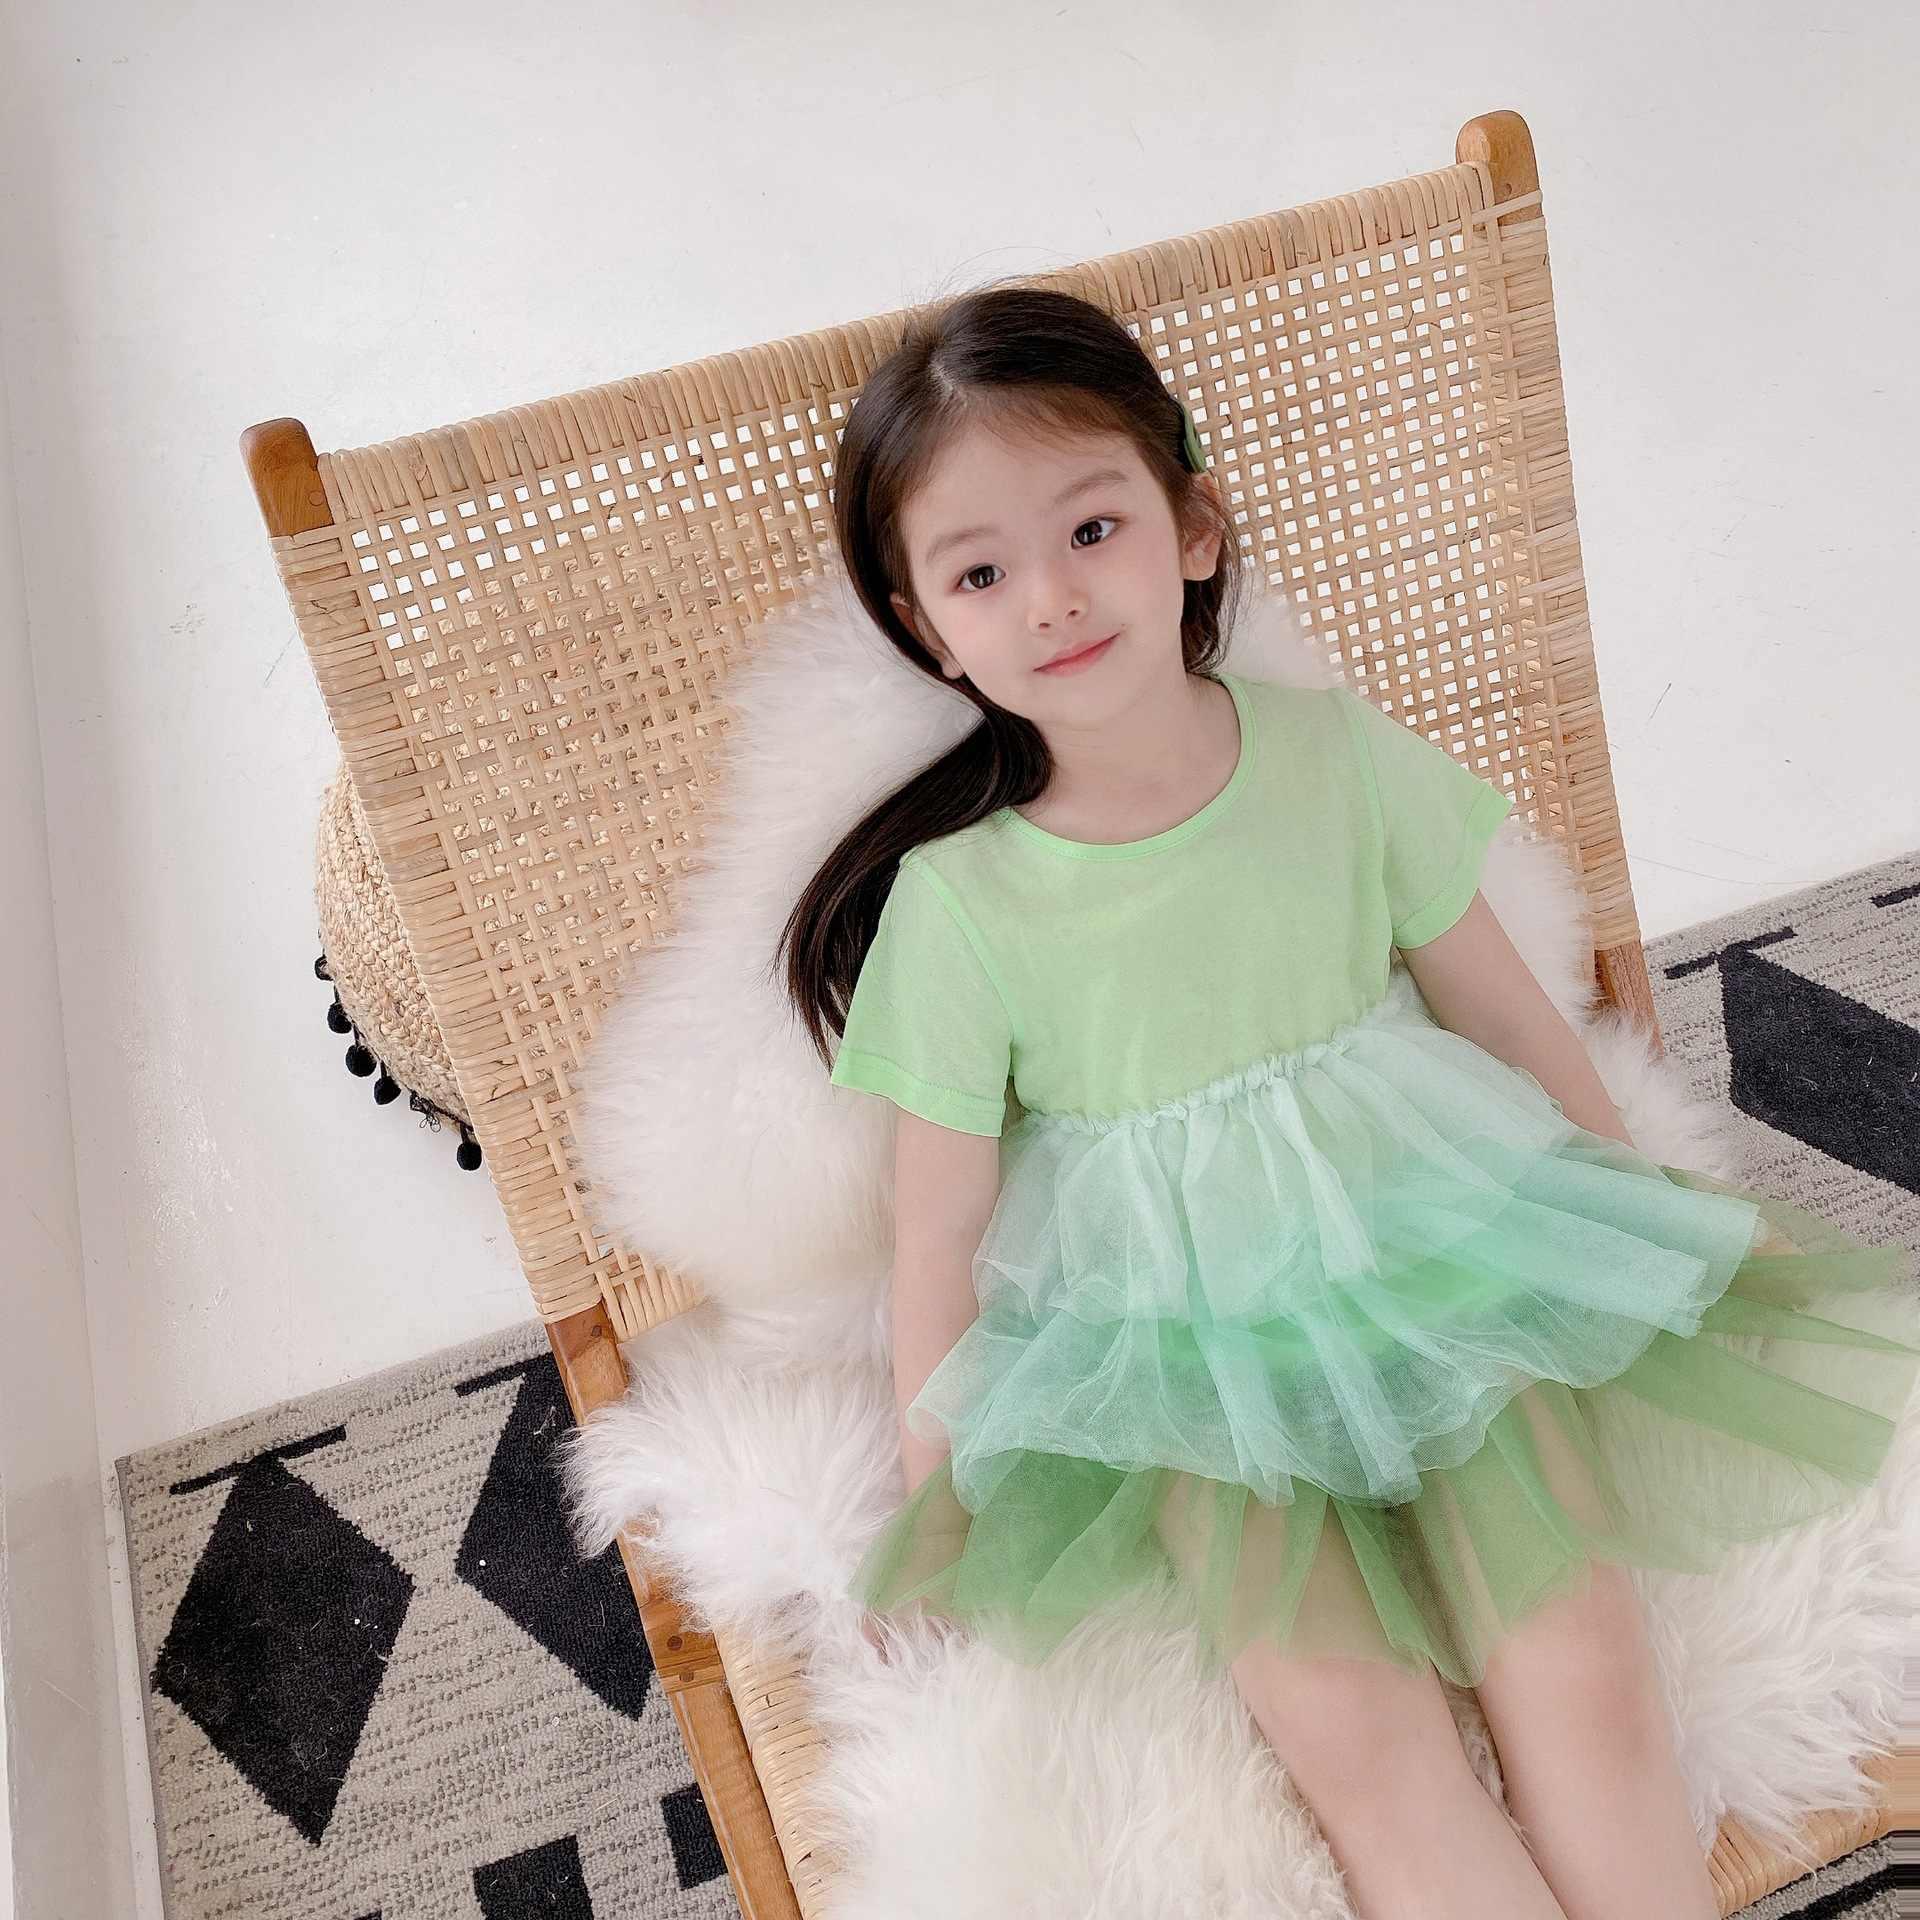 2020 Presell אפריל 10th קיץ בנות שמלה סגול ירוק ילדים איחה עיצוב טוטו שמלה